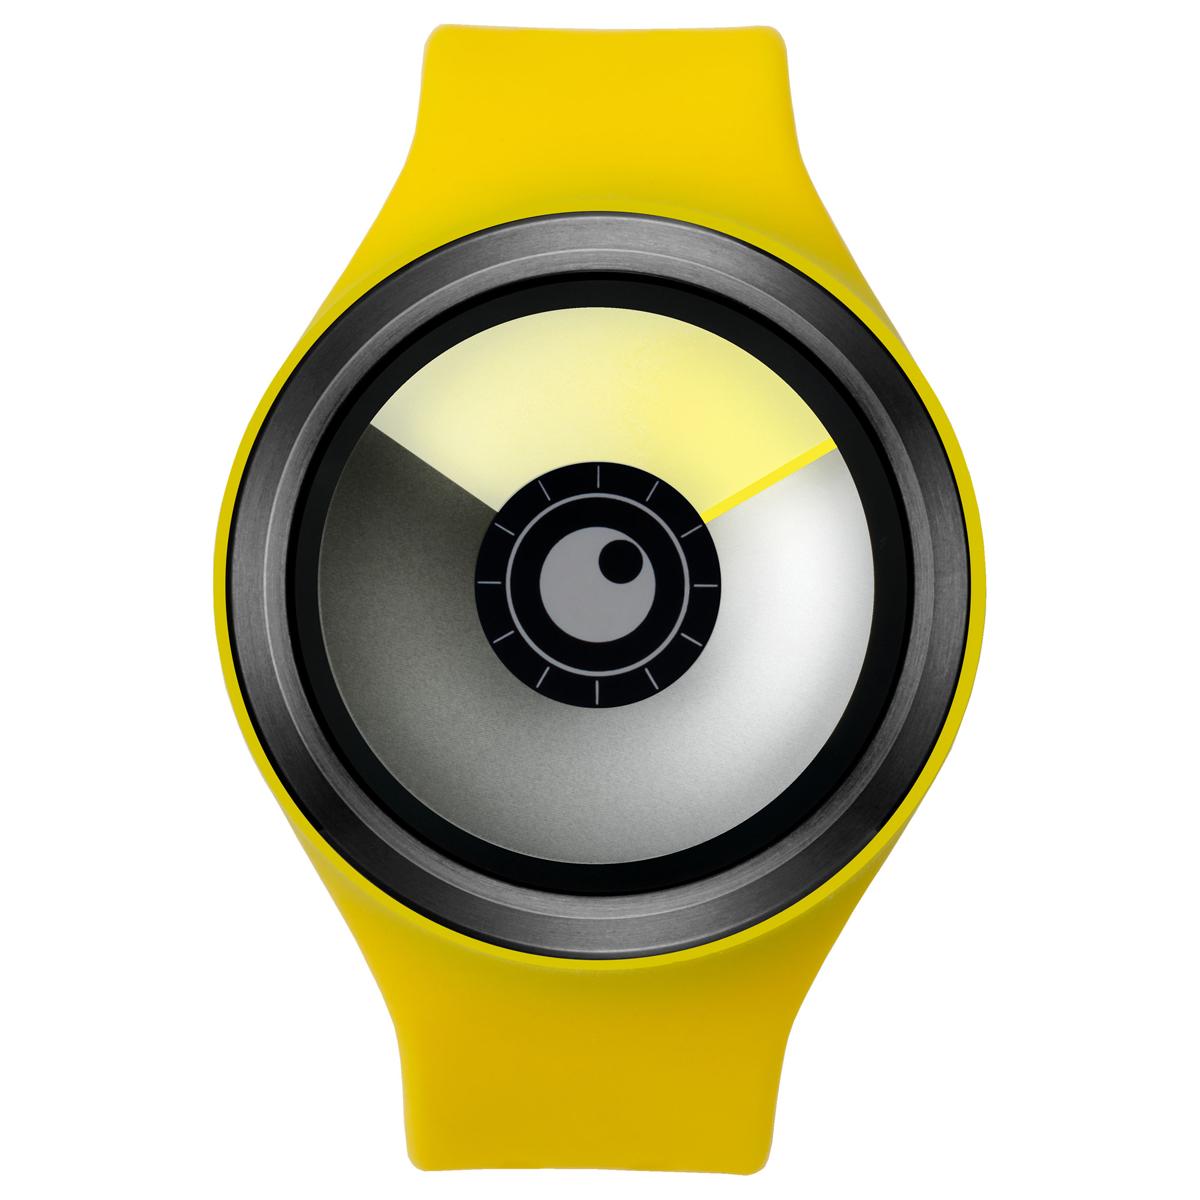 ZEROO AURORA BOREALIS ゼロ 電池式クォーツ 腕時計 [W00702B03SR09] イエロー デザインウォッチ ペア用 メンズ レディース ユニセックス おしゃれ時計 デザイナーズ